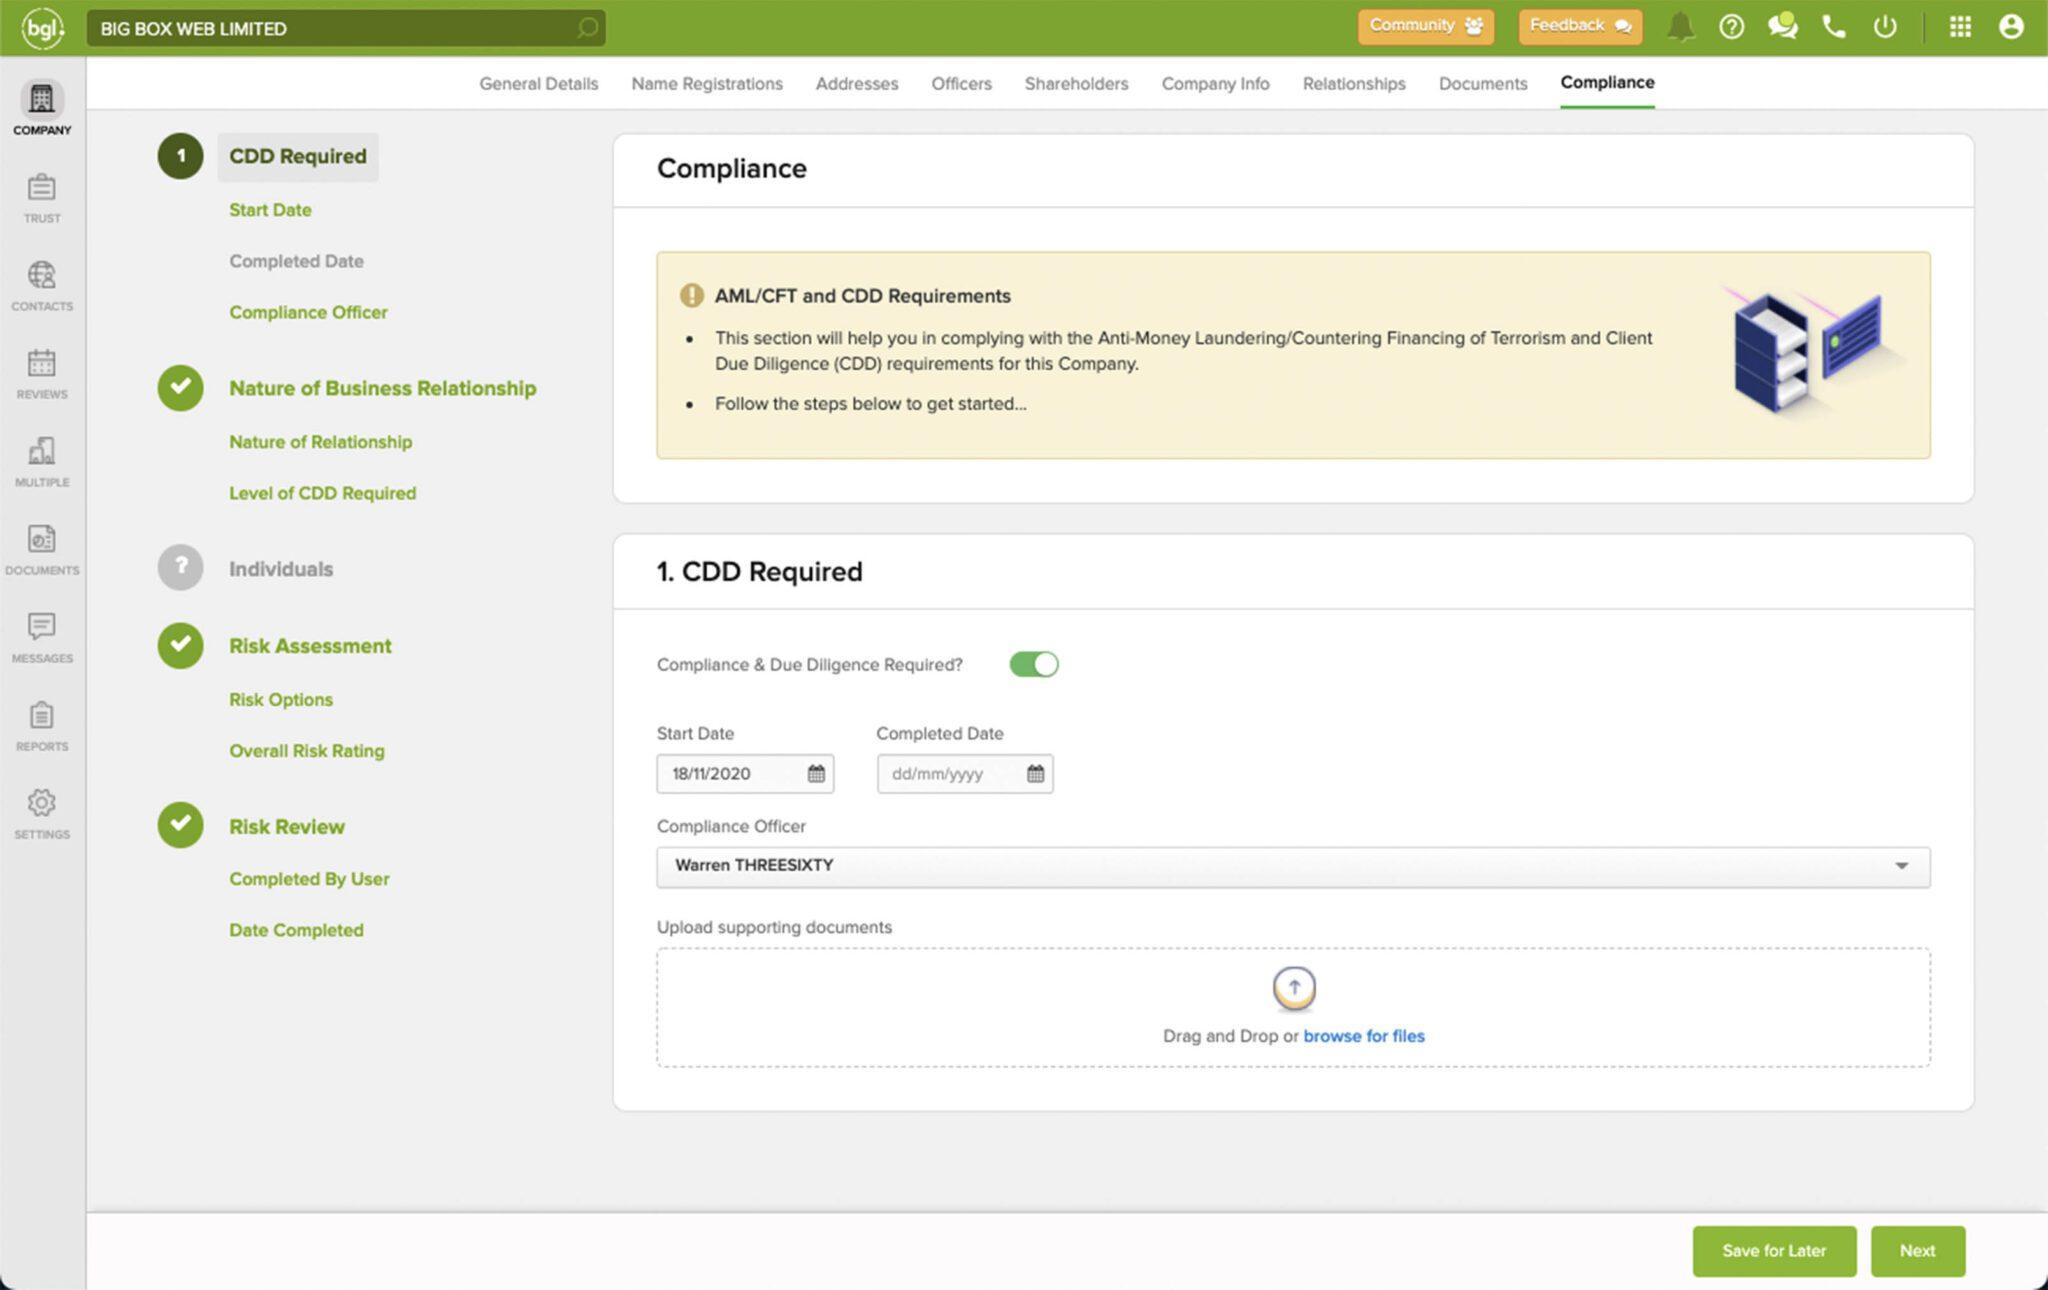 AML/CFT & CDD Compliance User Interface